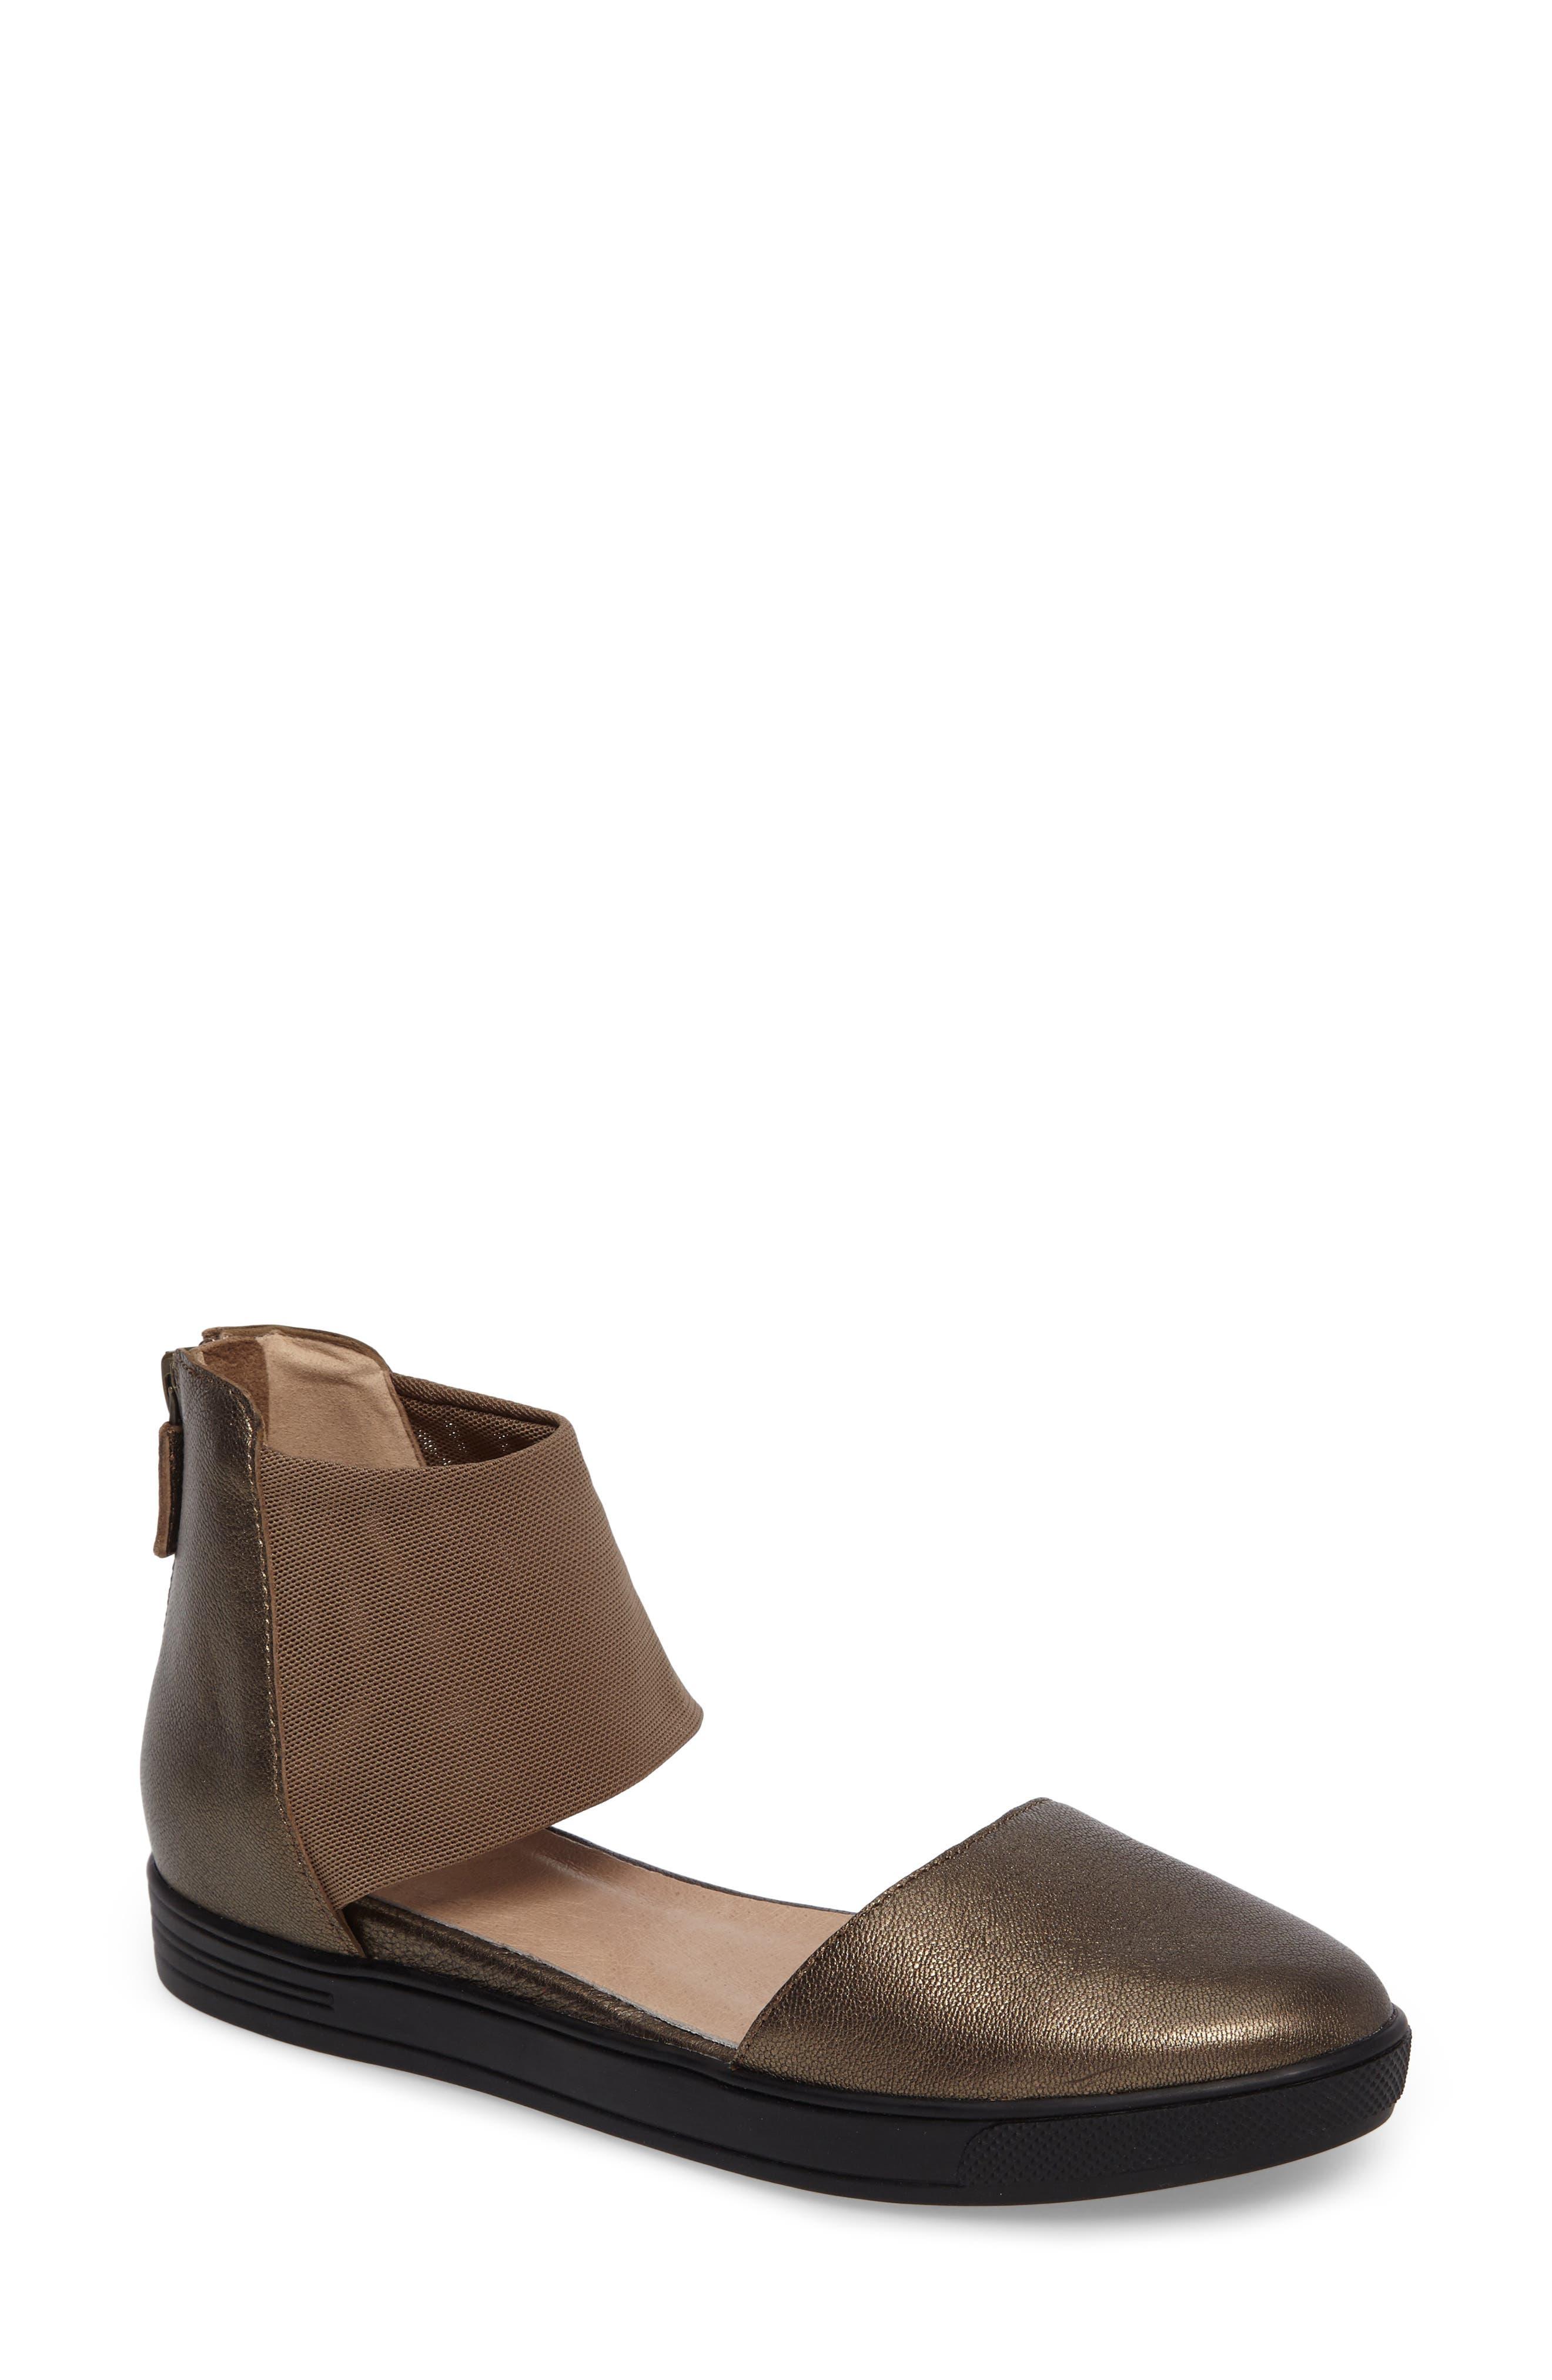 Main Image - Eileen Fisher Powell Ankle Cuff Sandal(Women)